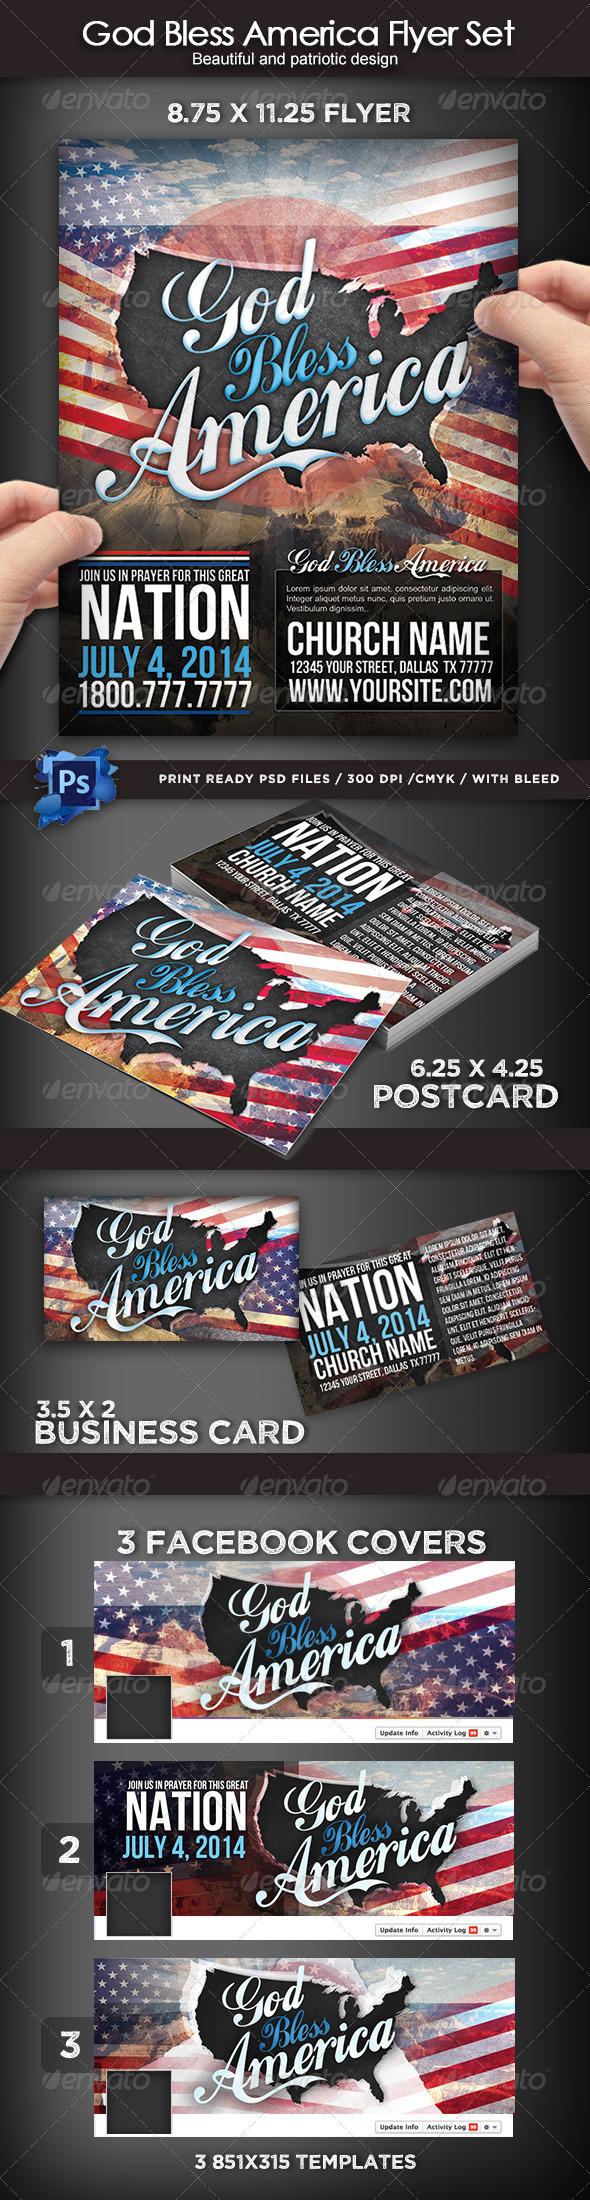 GraphicRiver God Bless America Flyer Set 7904758